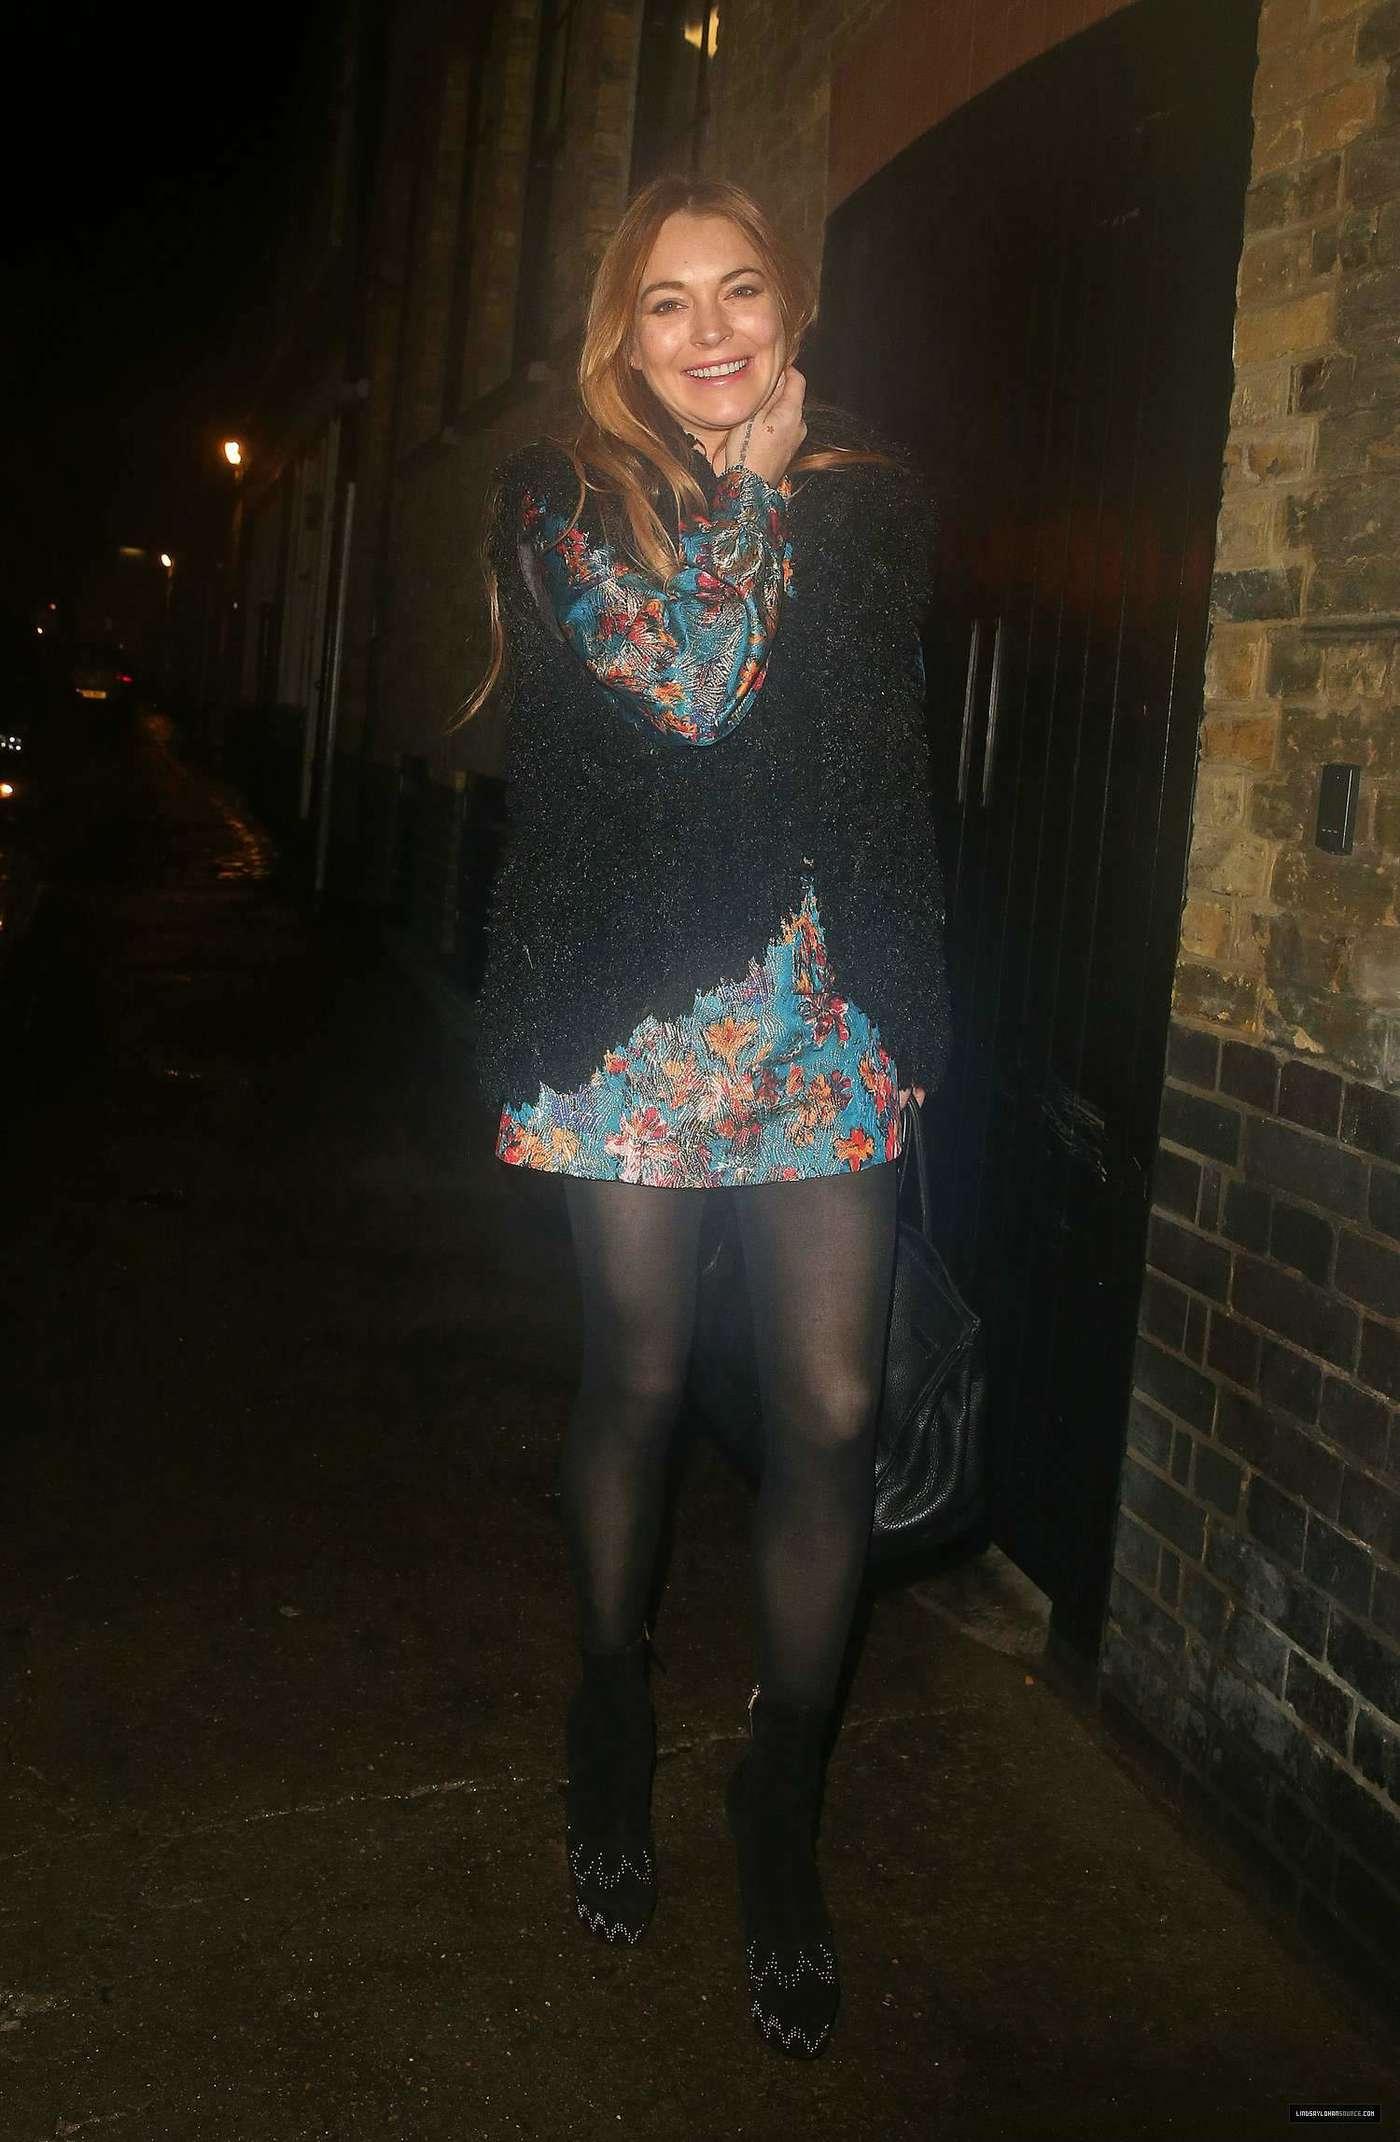 Lindsay Lohan 2014 : Lindsay Lohan in Mini Dress Leaves the Chiltern Firehouse -16